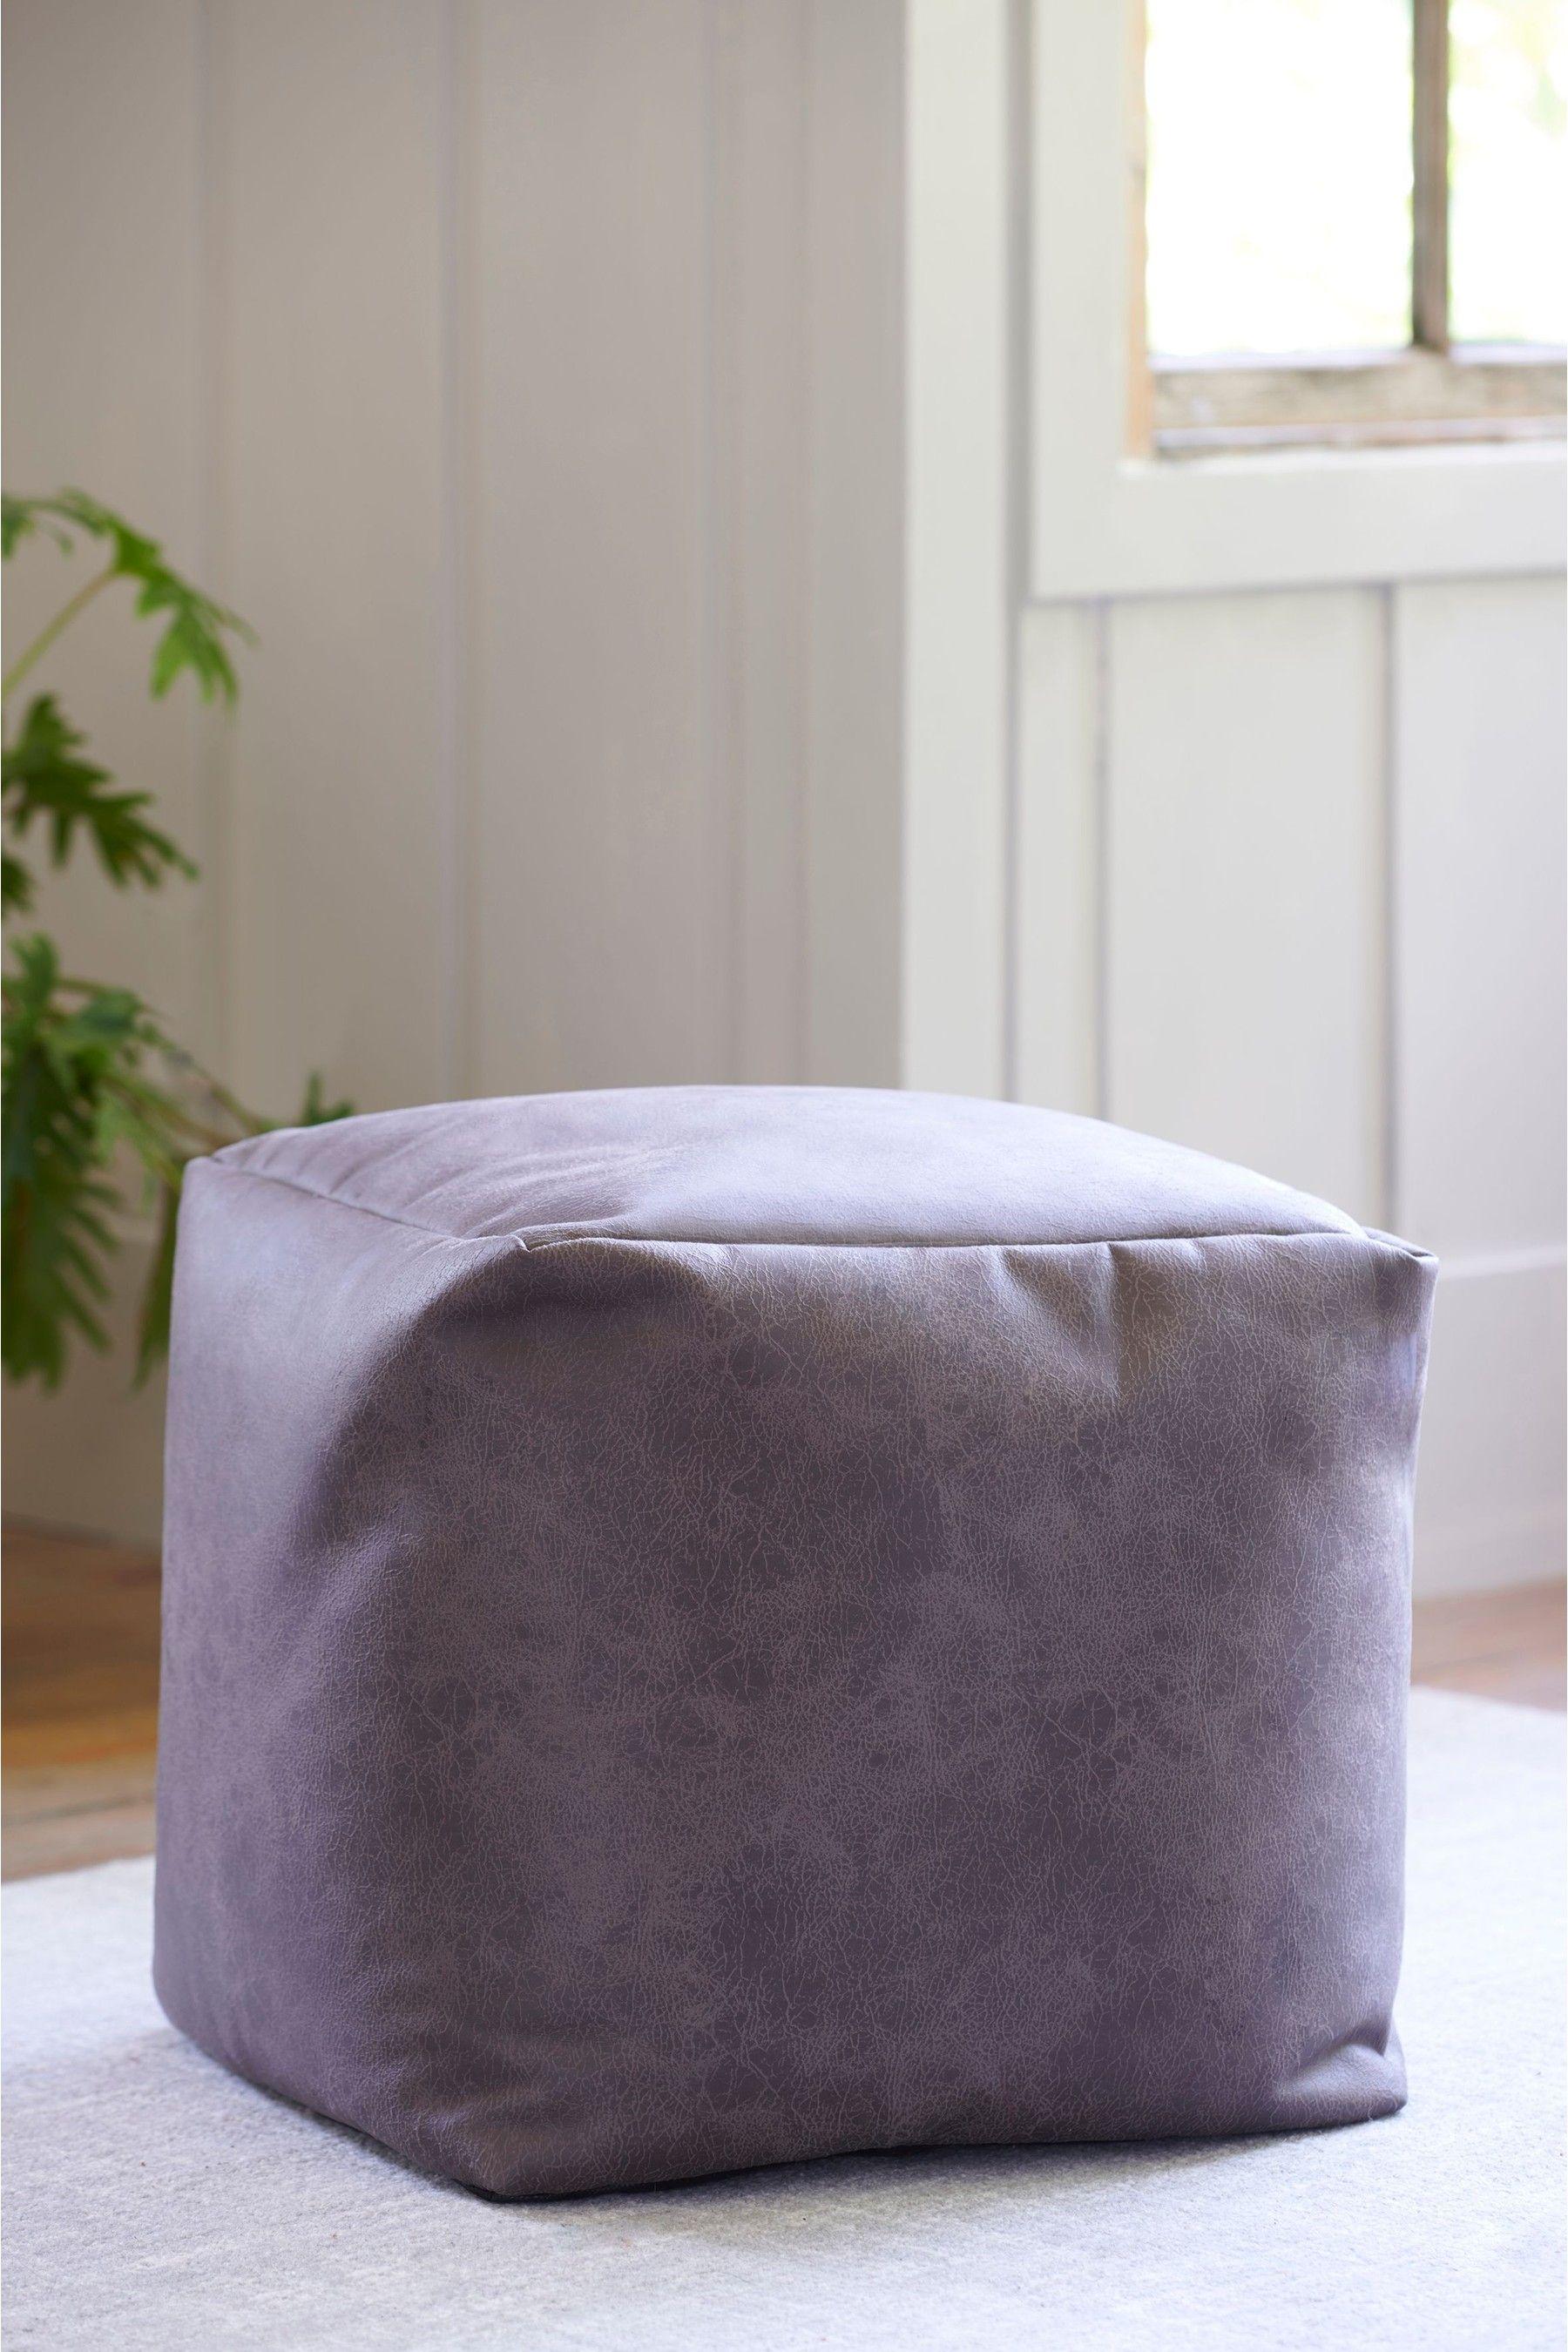 Next Monza Faux Leather Cube Grey